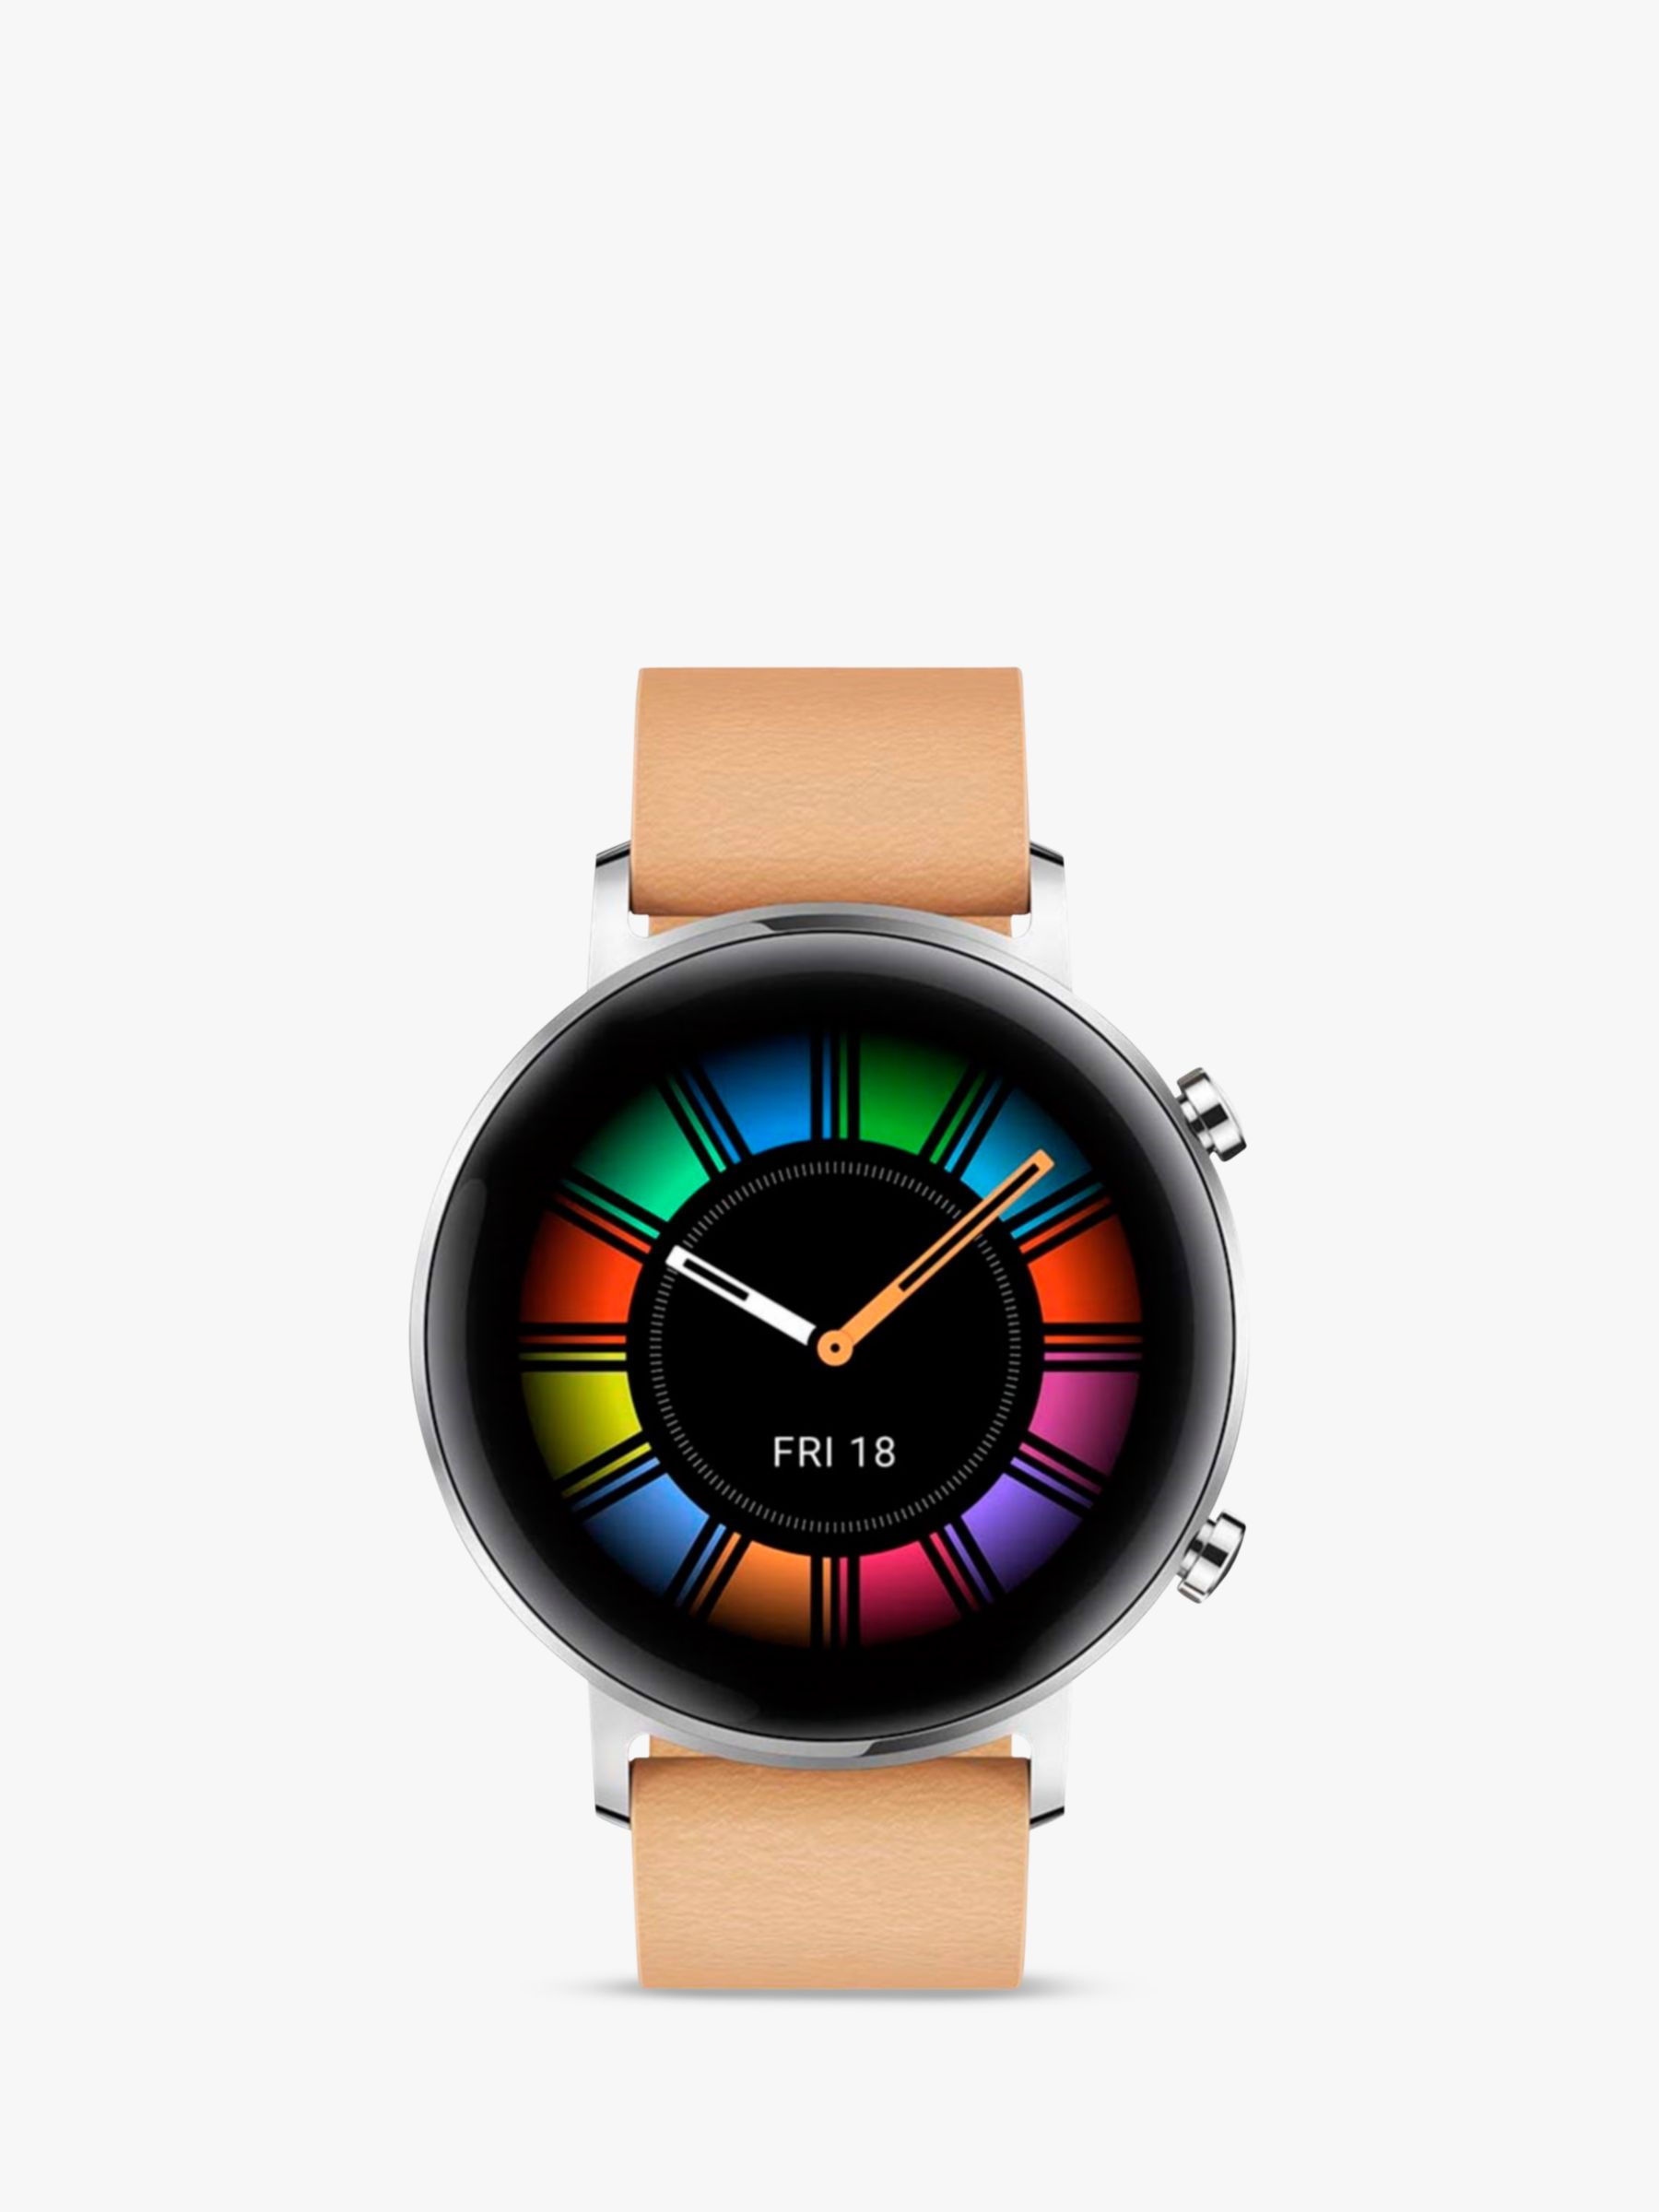 Huawei Huawei Watch GT 2 Smart Watch with GPS, 42mm, Gravel Beige